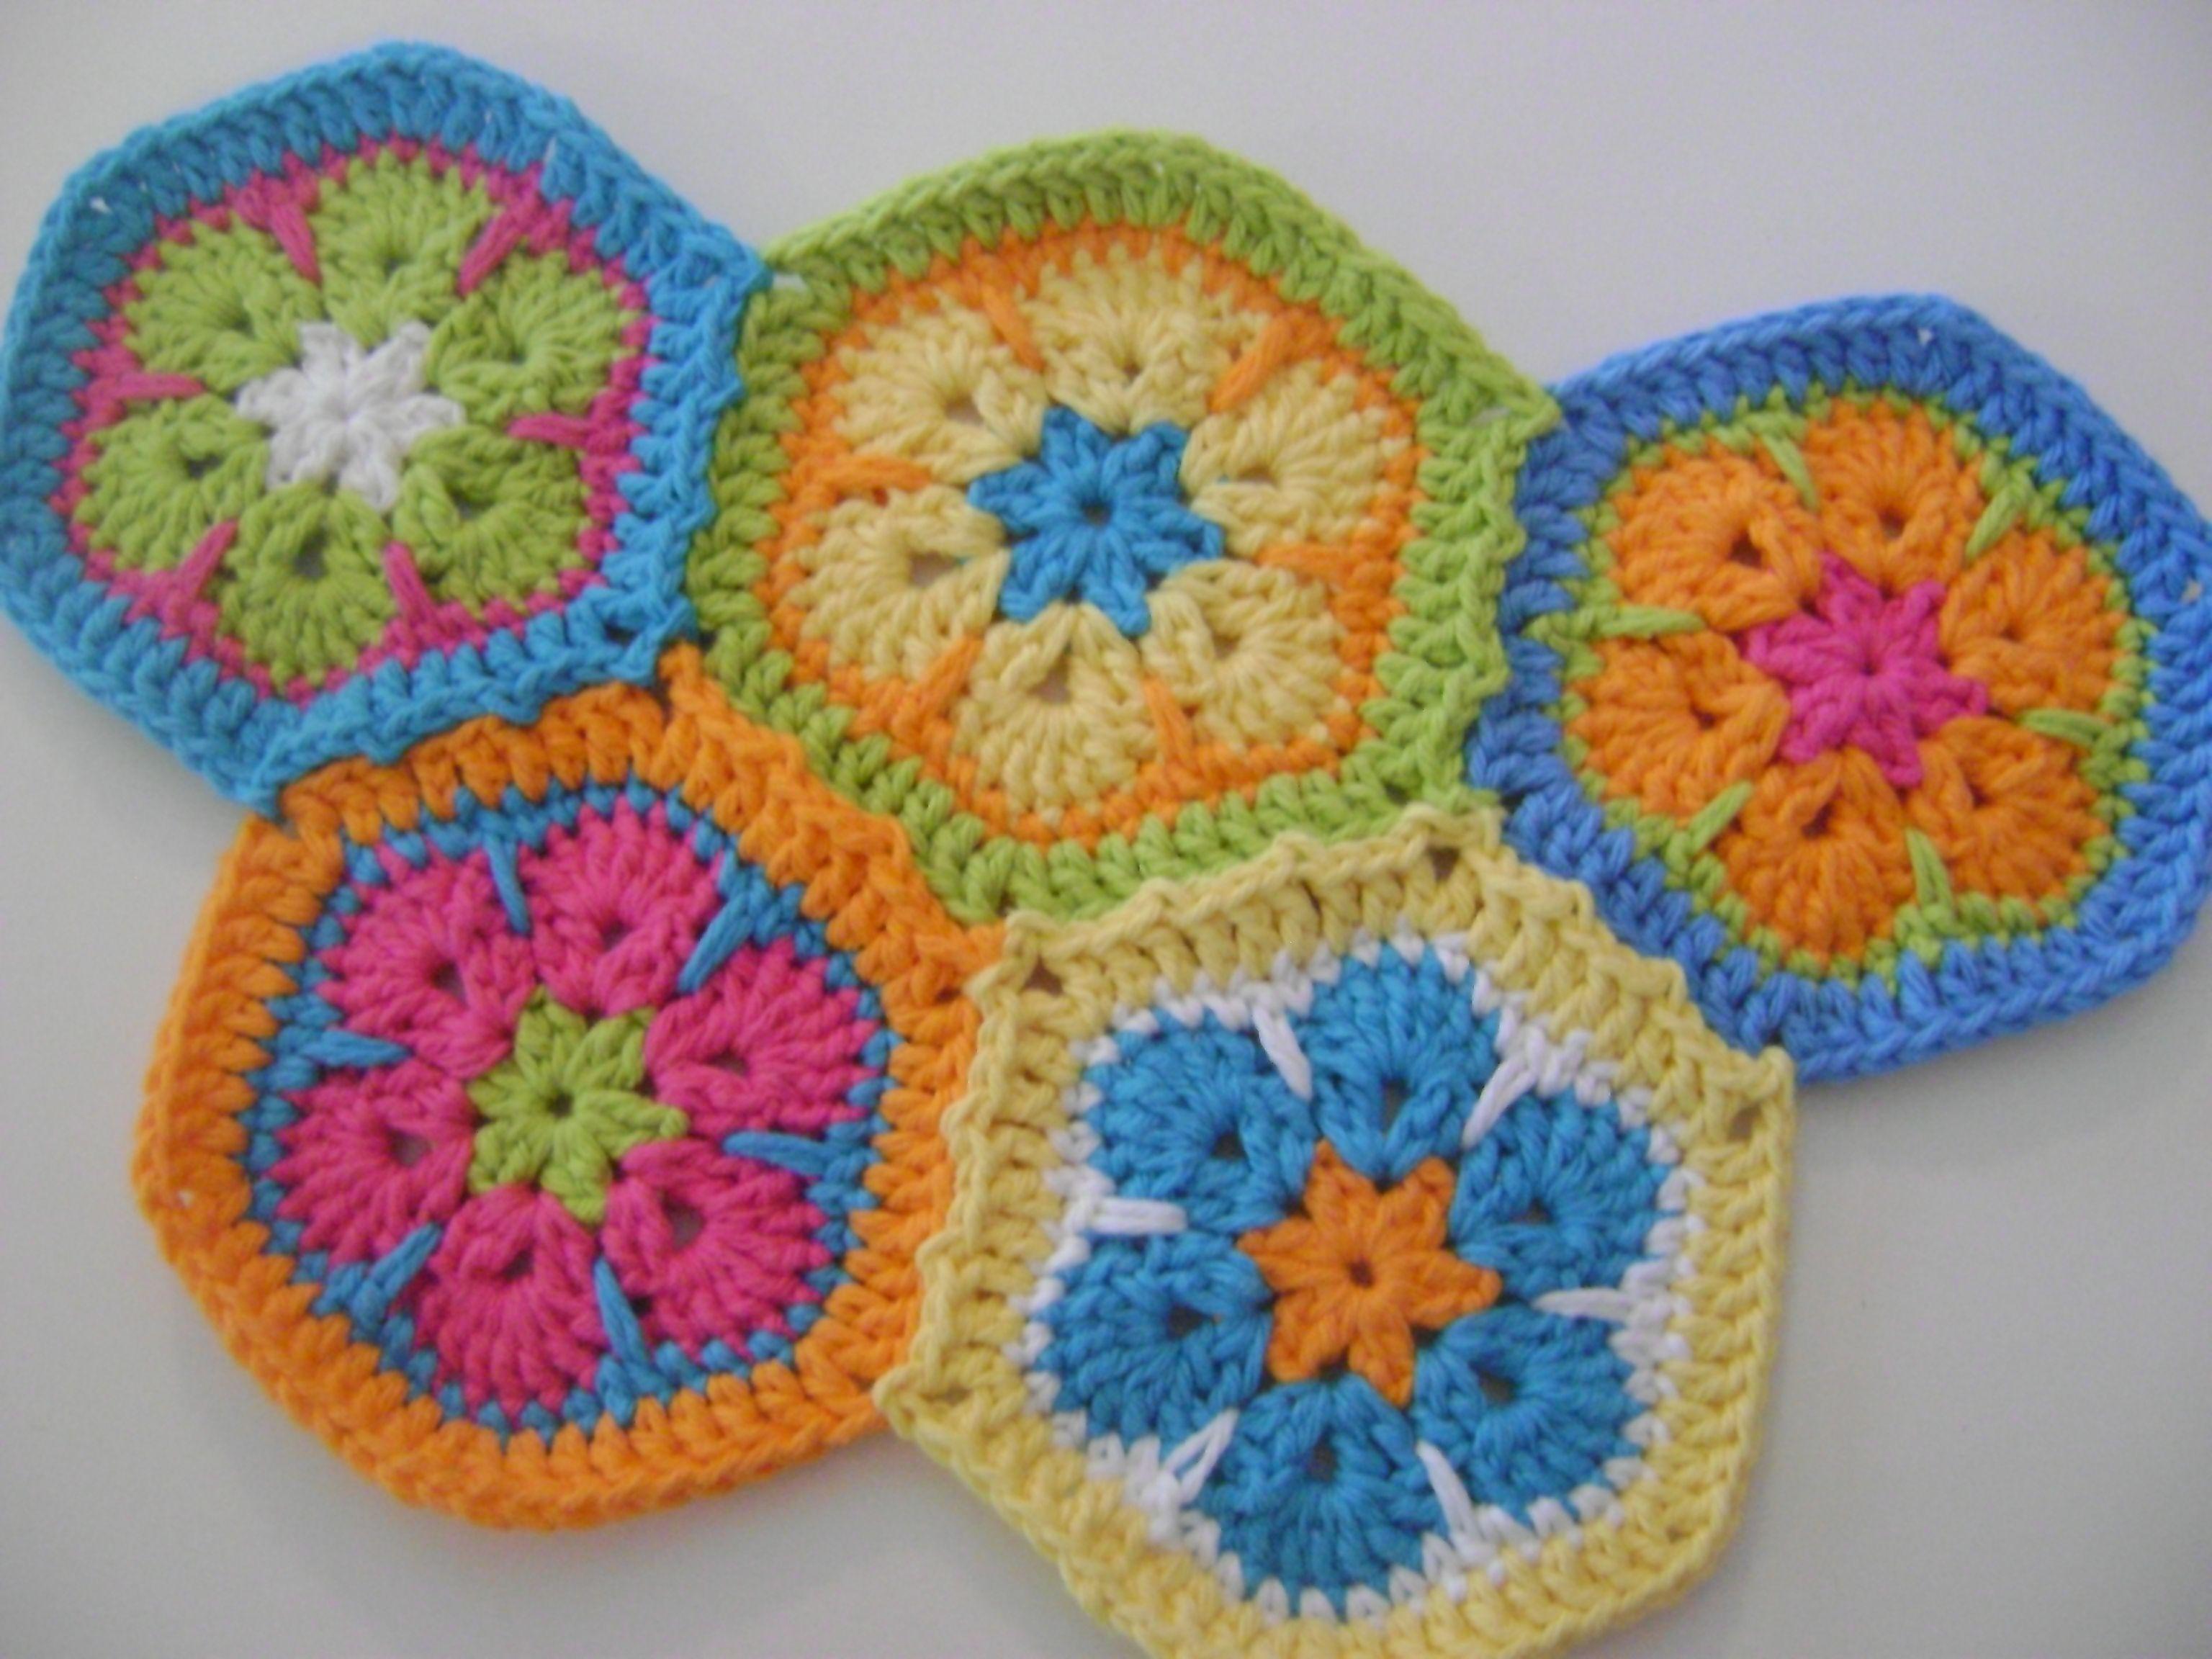 Hexagons On Point in 10 Free Patterns | Hexagon crochet pattern ...